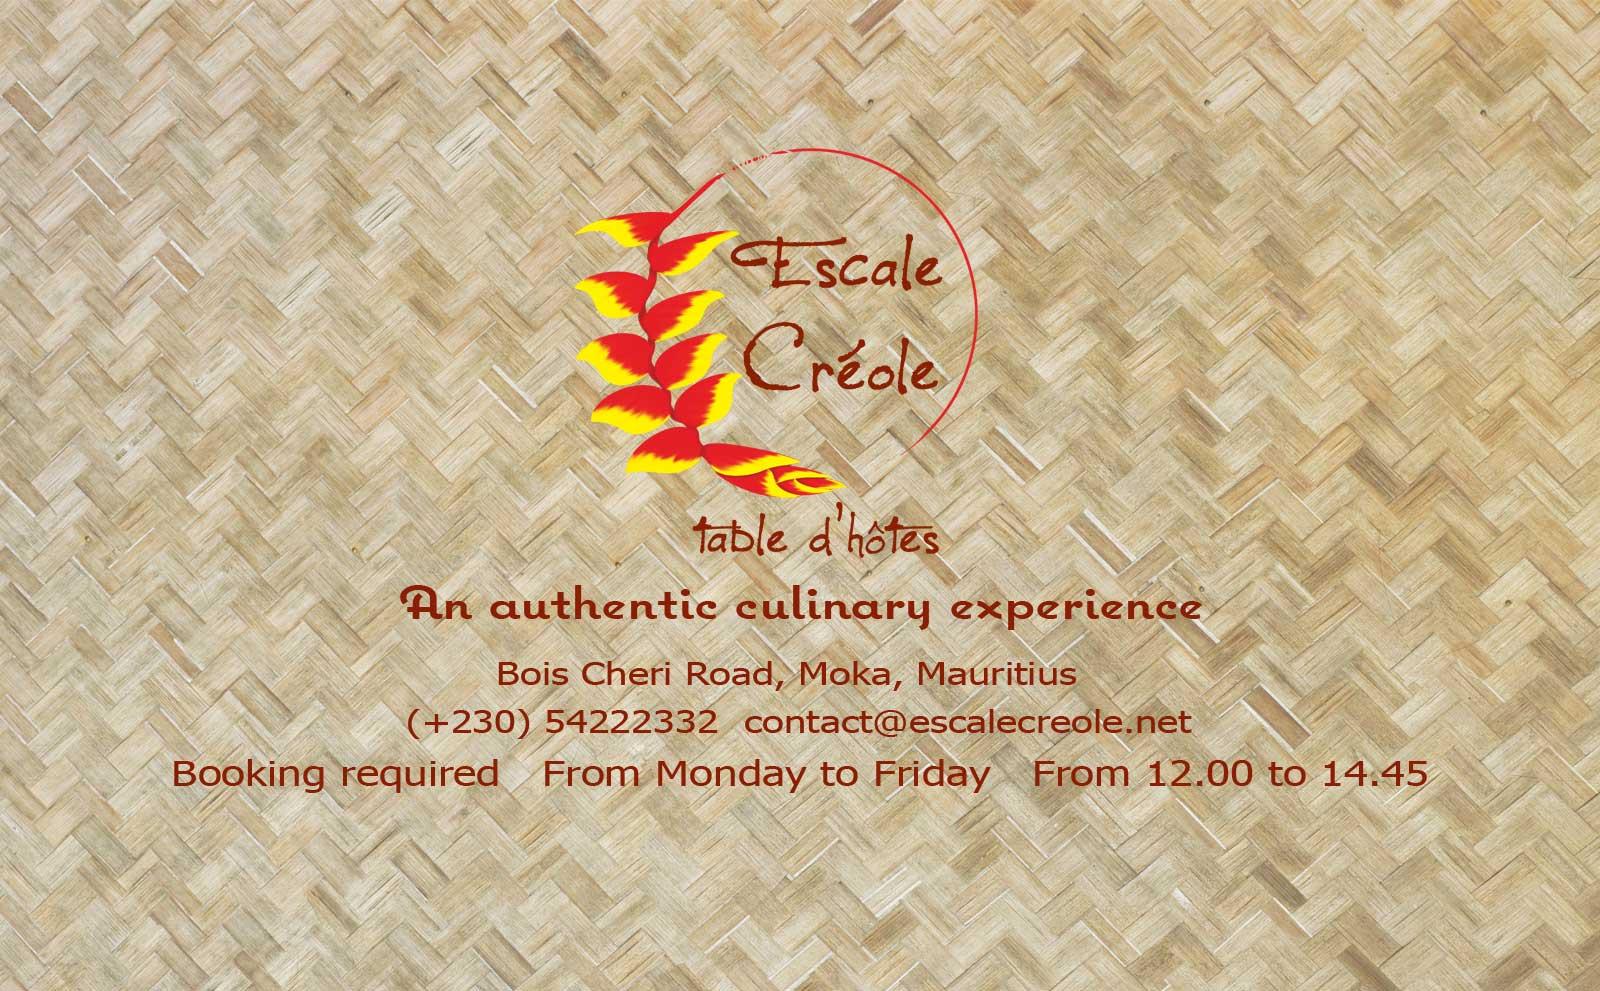 escale creole